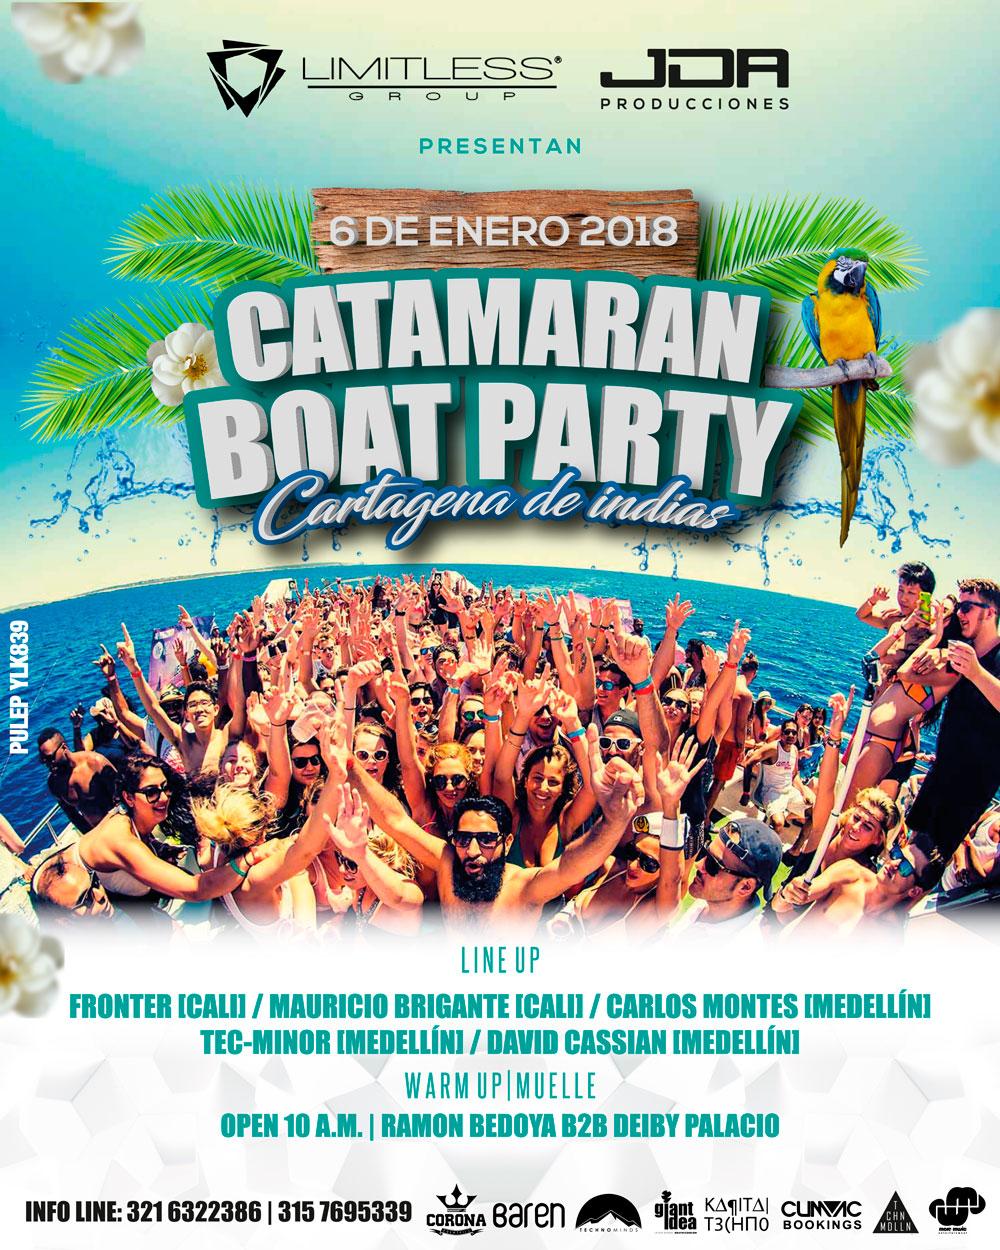 CATAMARAN BOAT PARTY